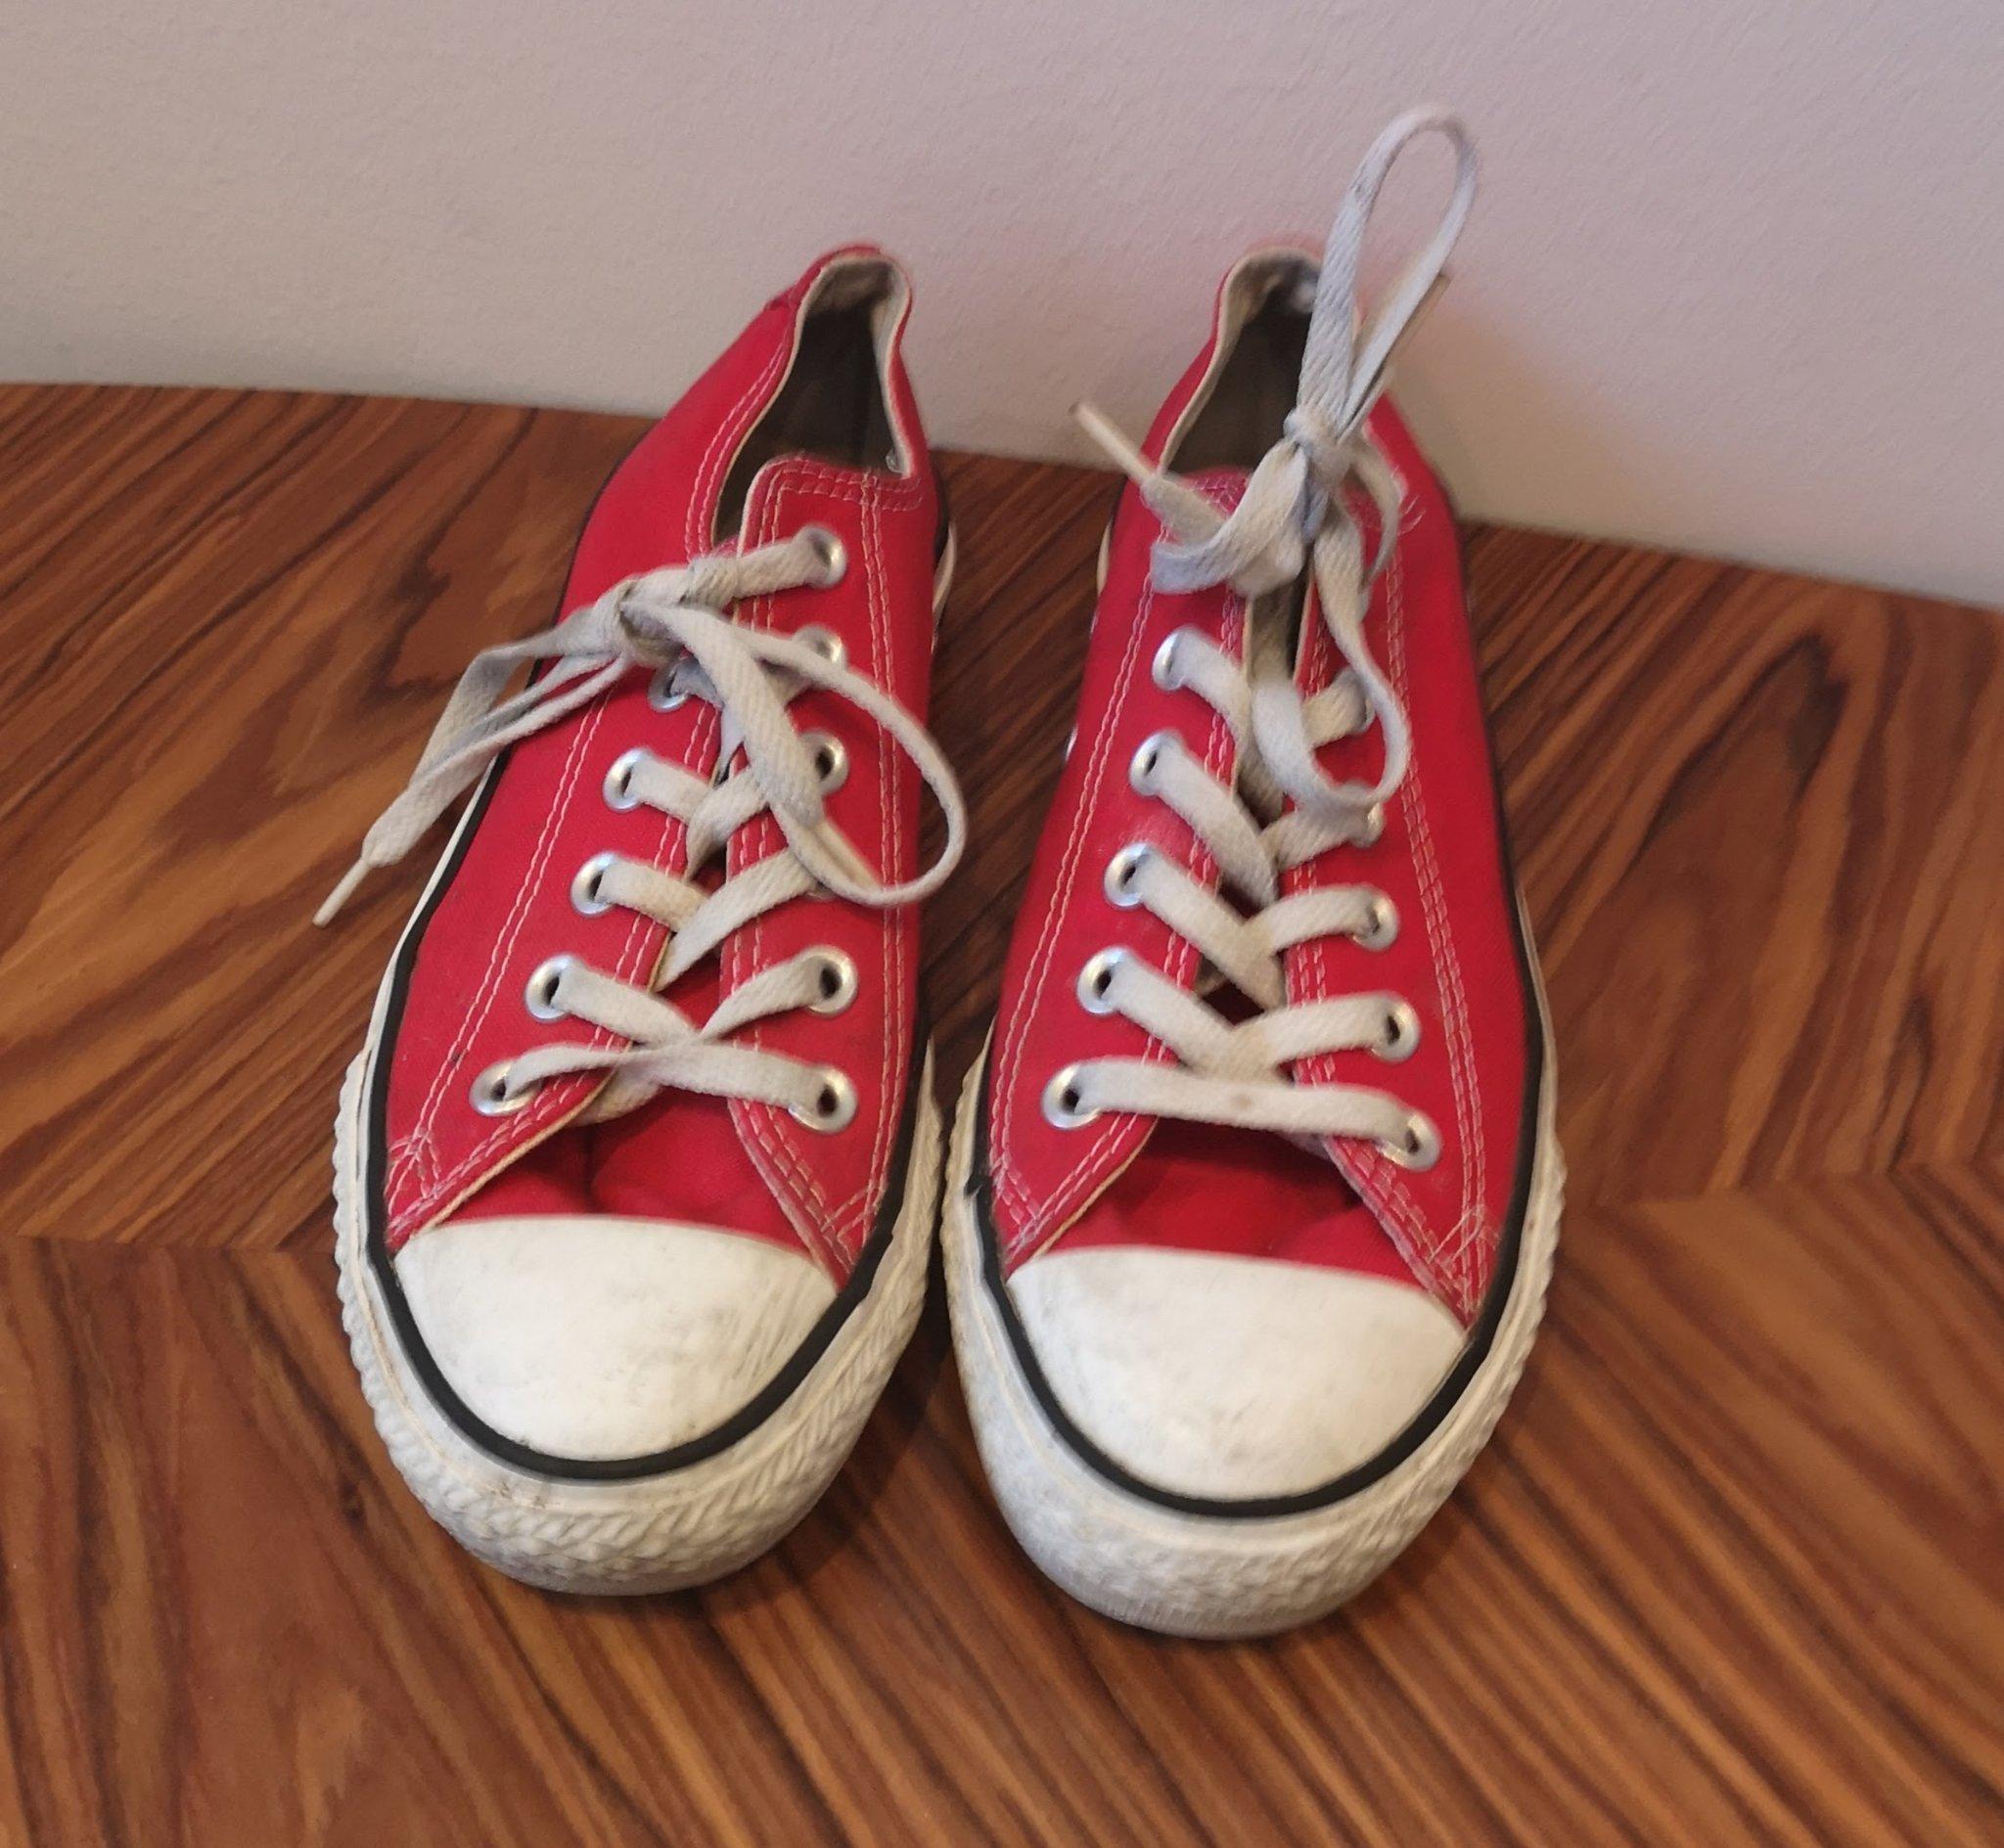 48124696456 CONVERSE CHUCK TAYLOR ALL STAR Röda Sneakers / .. (353107587) ᐈ Köp ...